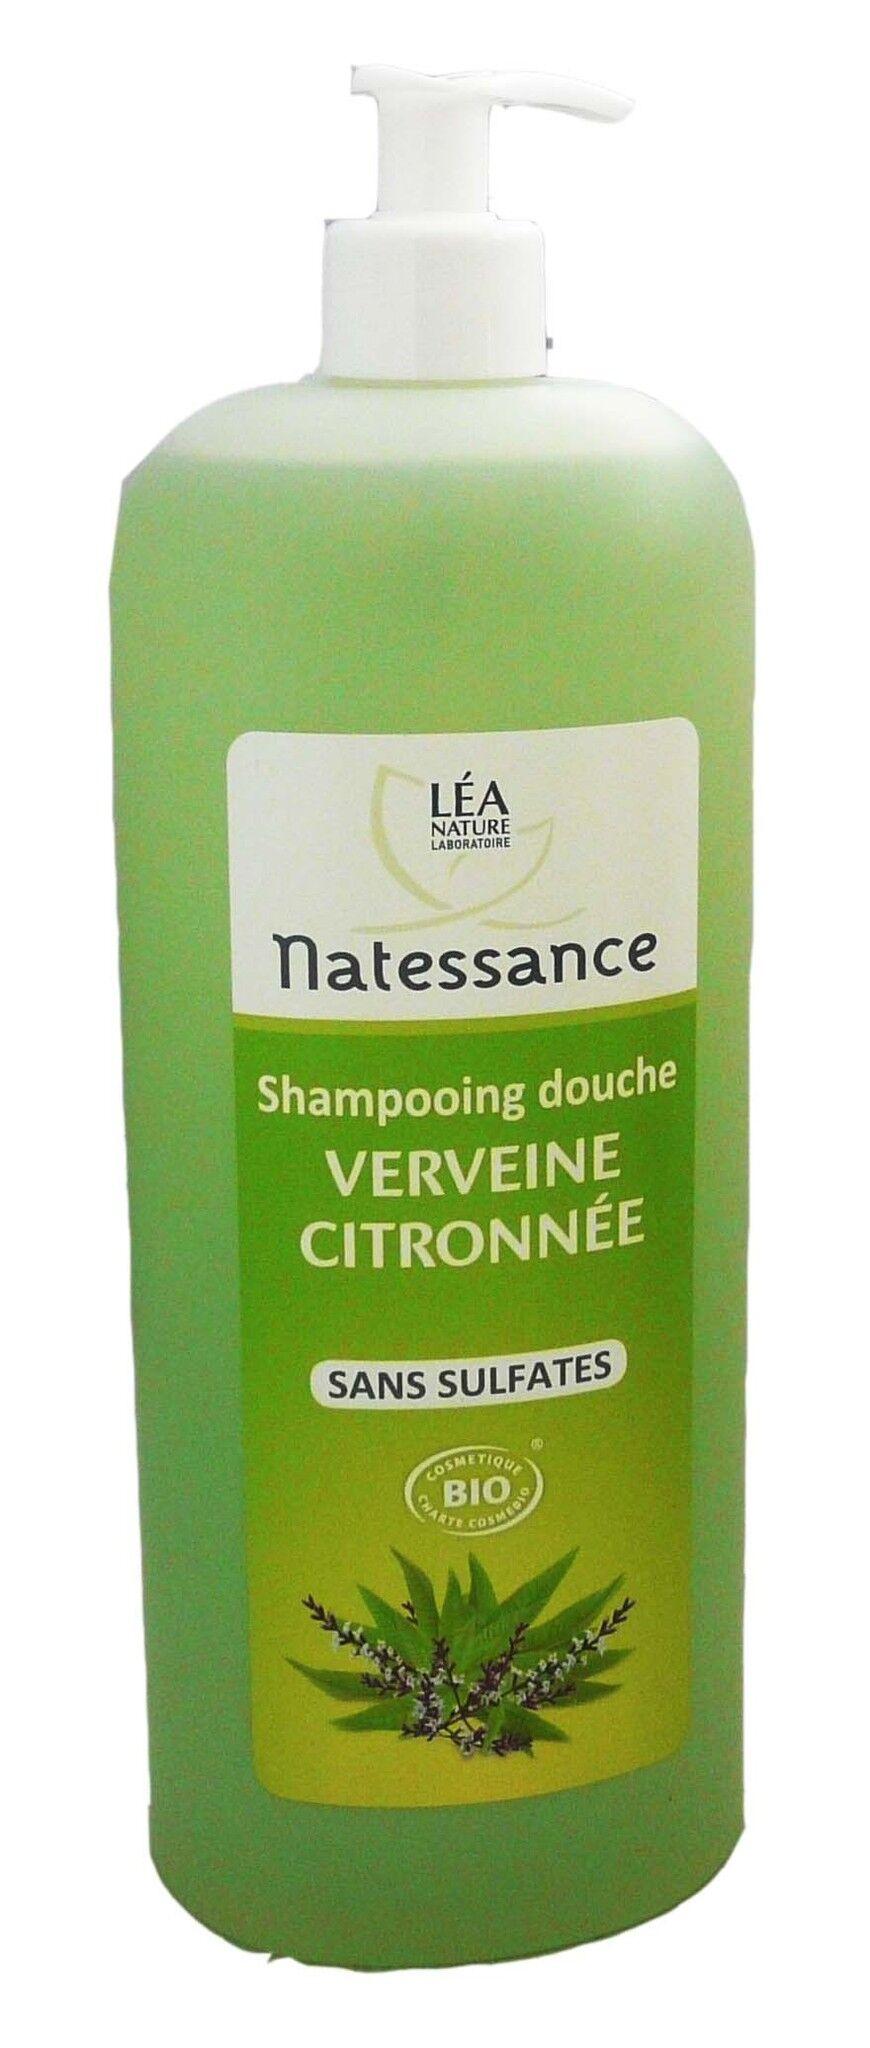 Natessance shampooing douche verveine citronnee 1l